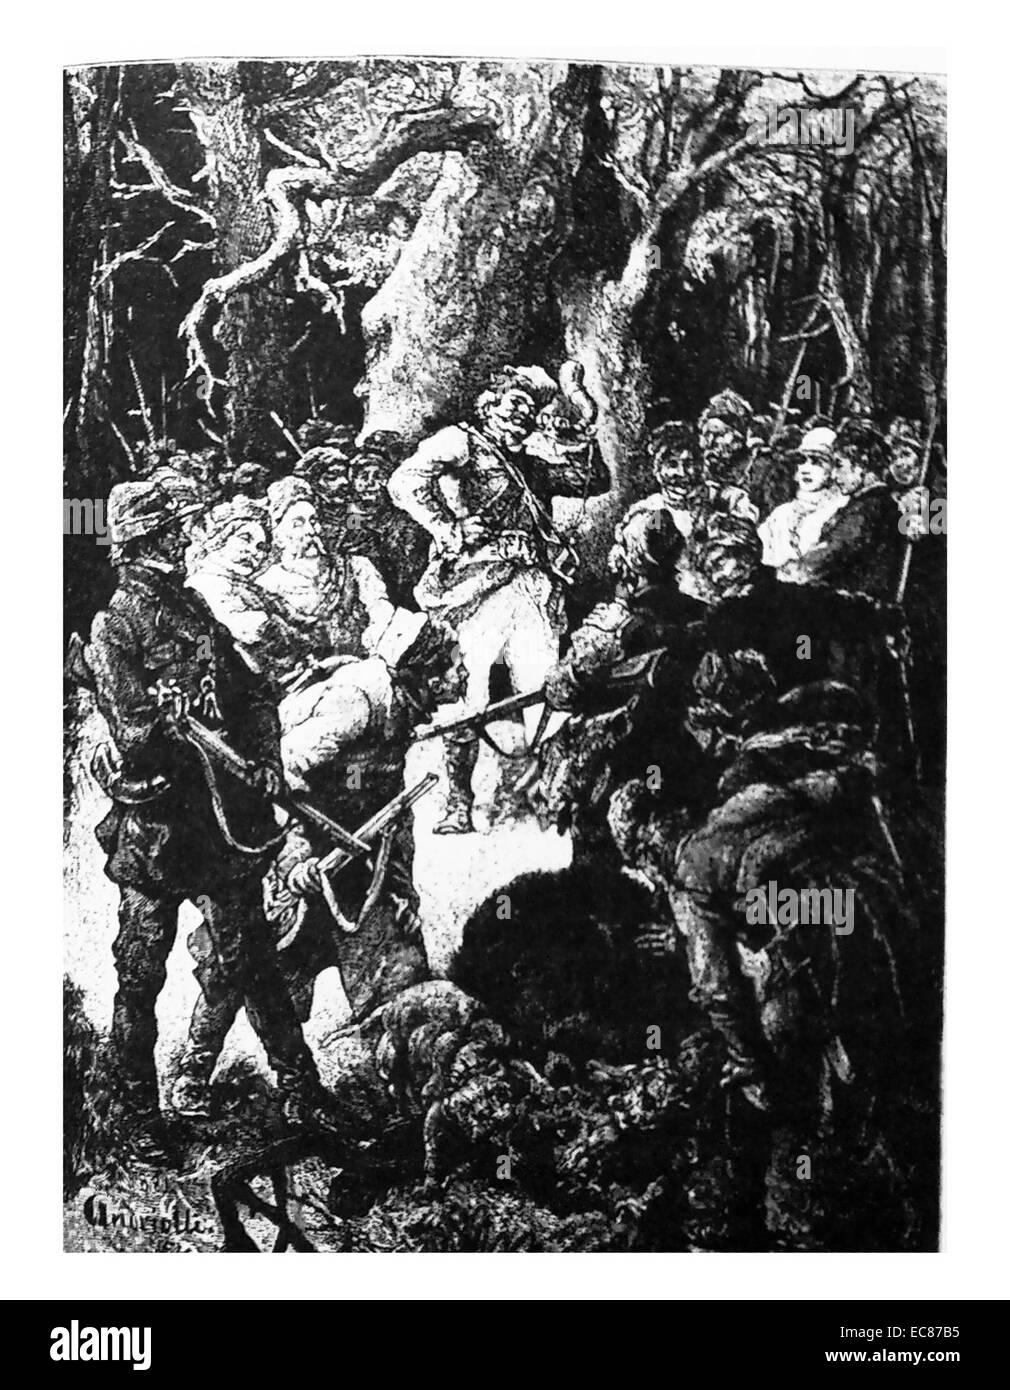 Illustration by Adam Bernard Mickiewicz - Stock Image